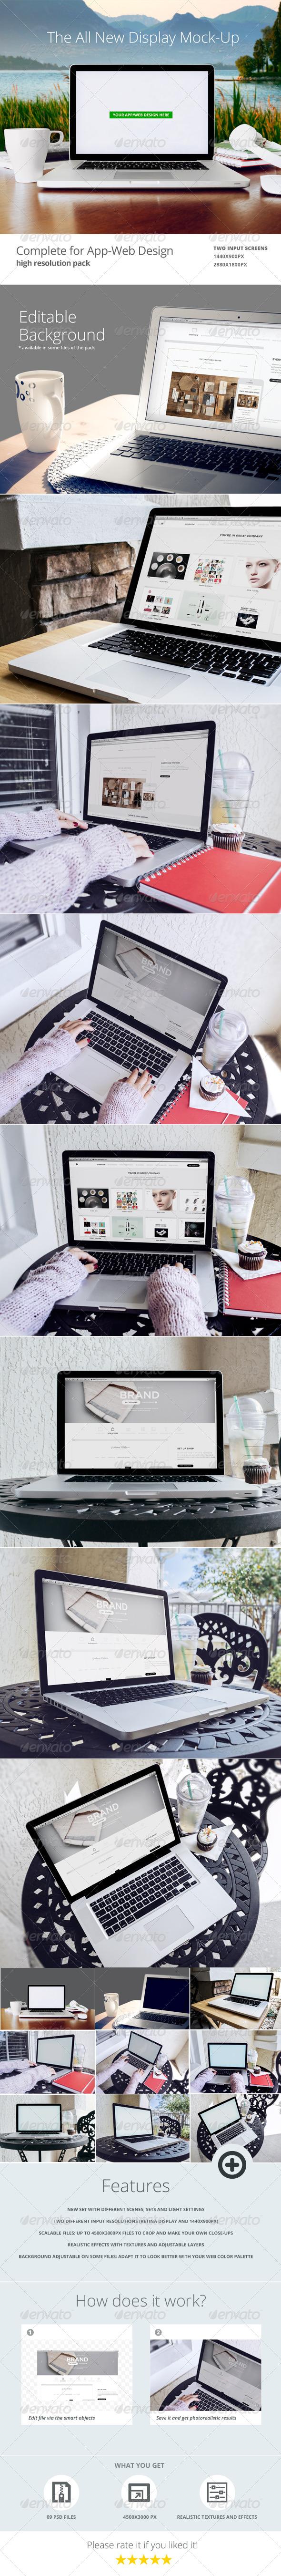 GraphicRiver Laptop Web App Mock-Up 6372840